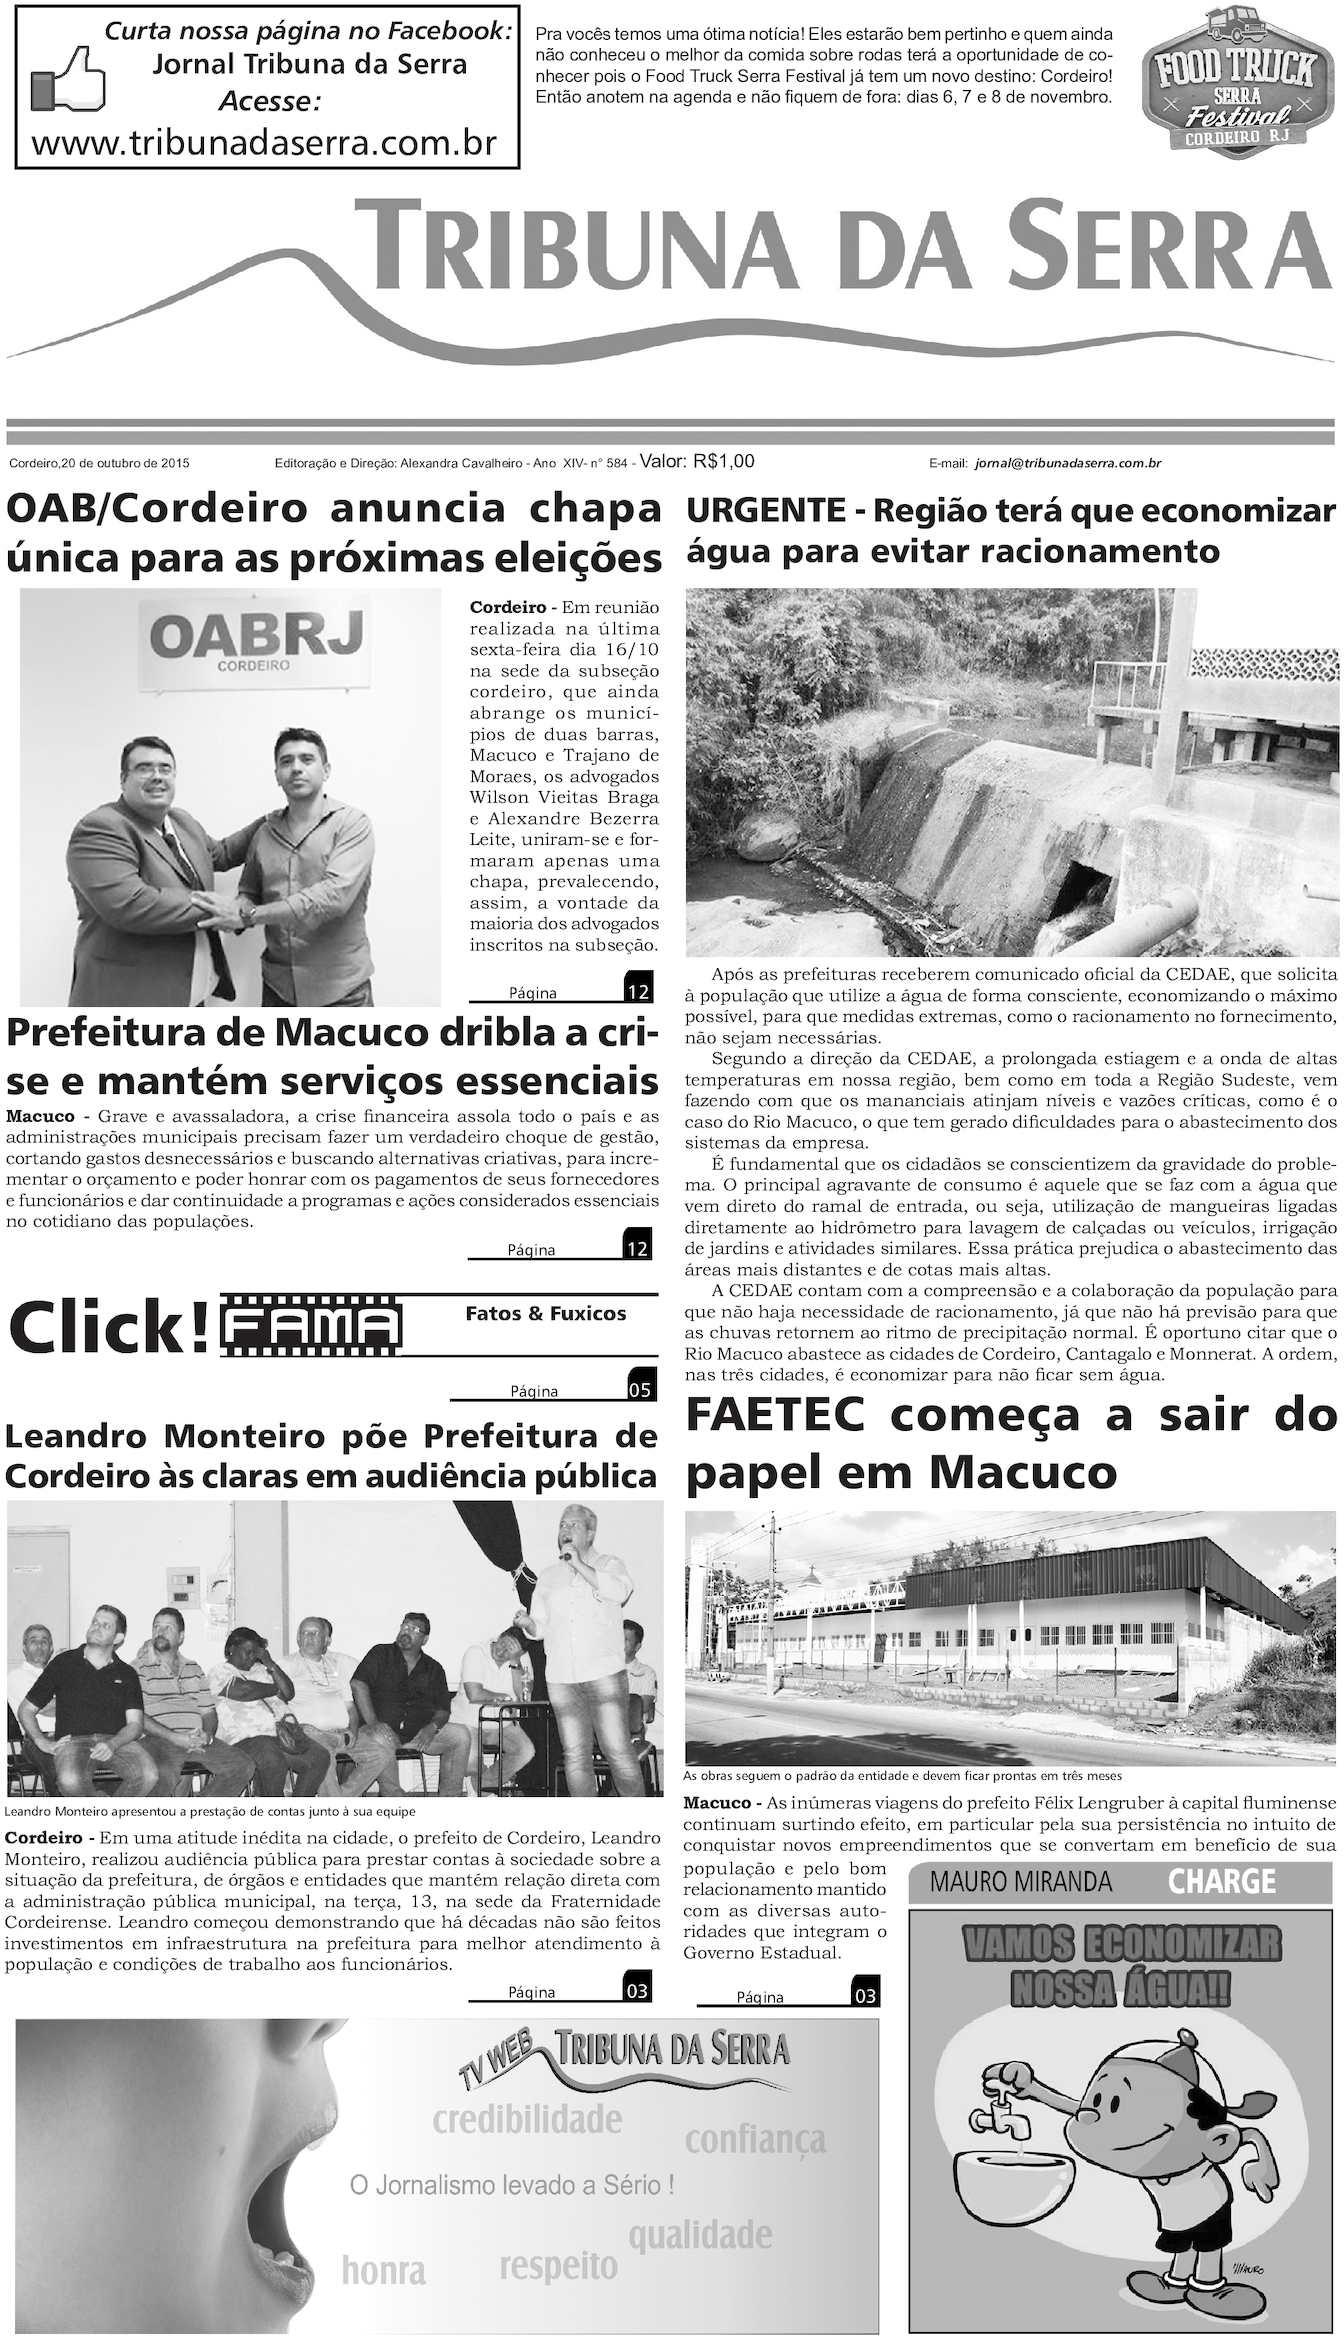 Calaméo - Jornaltribunadaserra Ed 584 1 12 b387f52c0090e